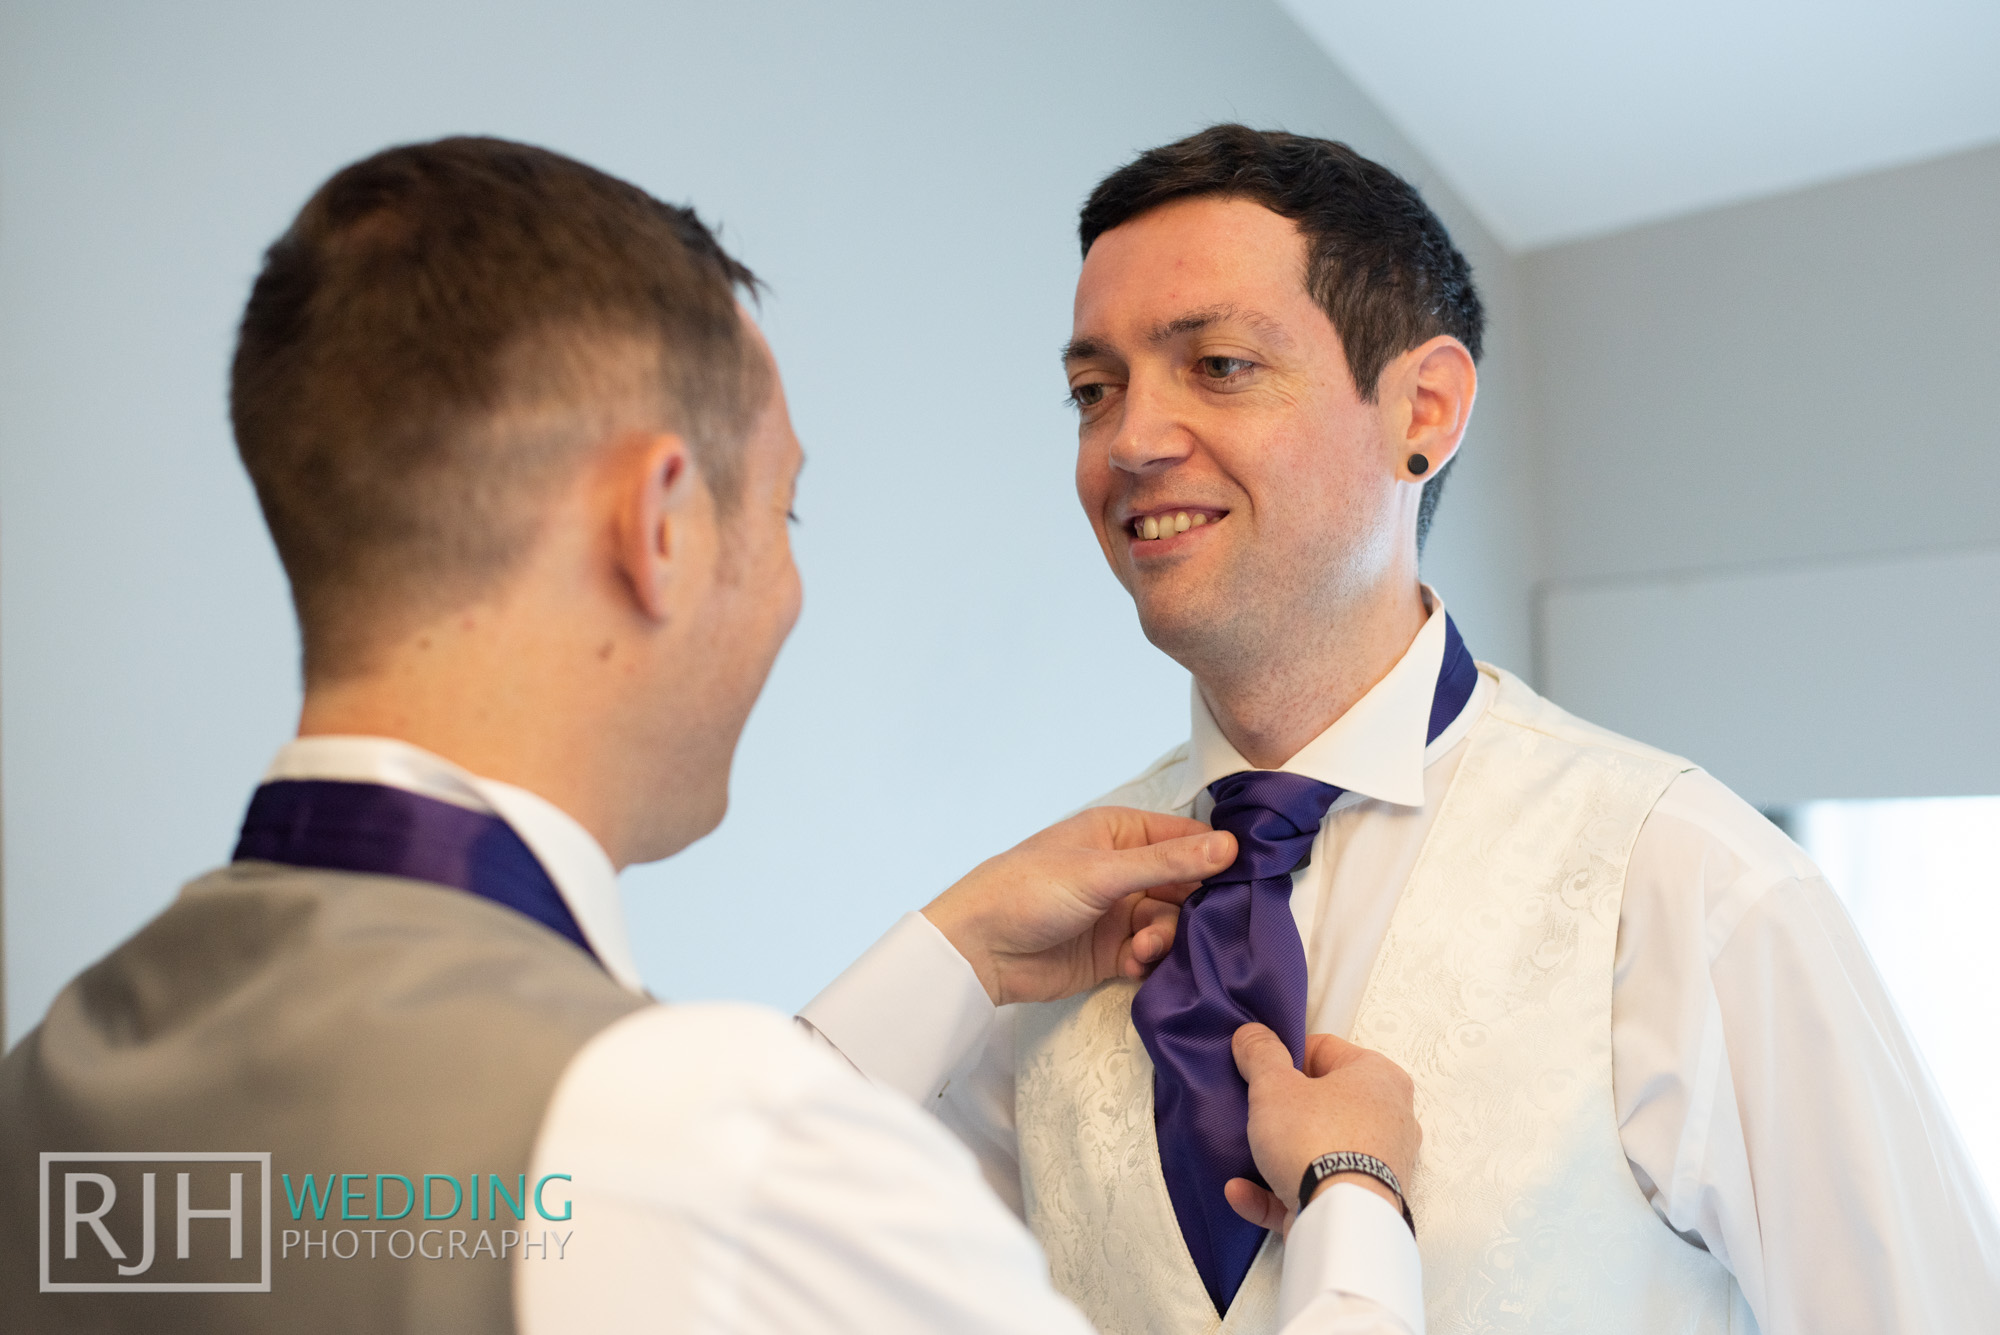 Oulton Hall Wedding Photography_Goodwill-Hall_004_DSC_2894.jpg